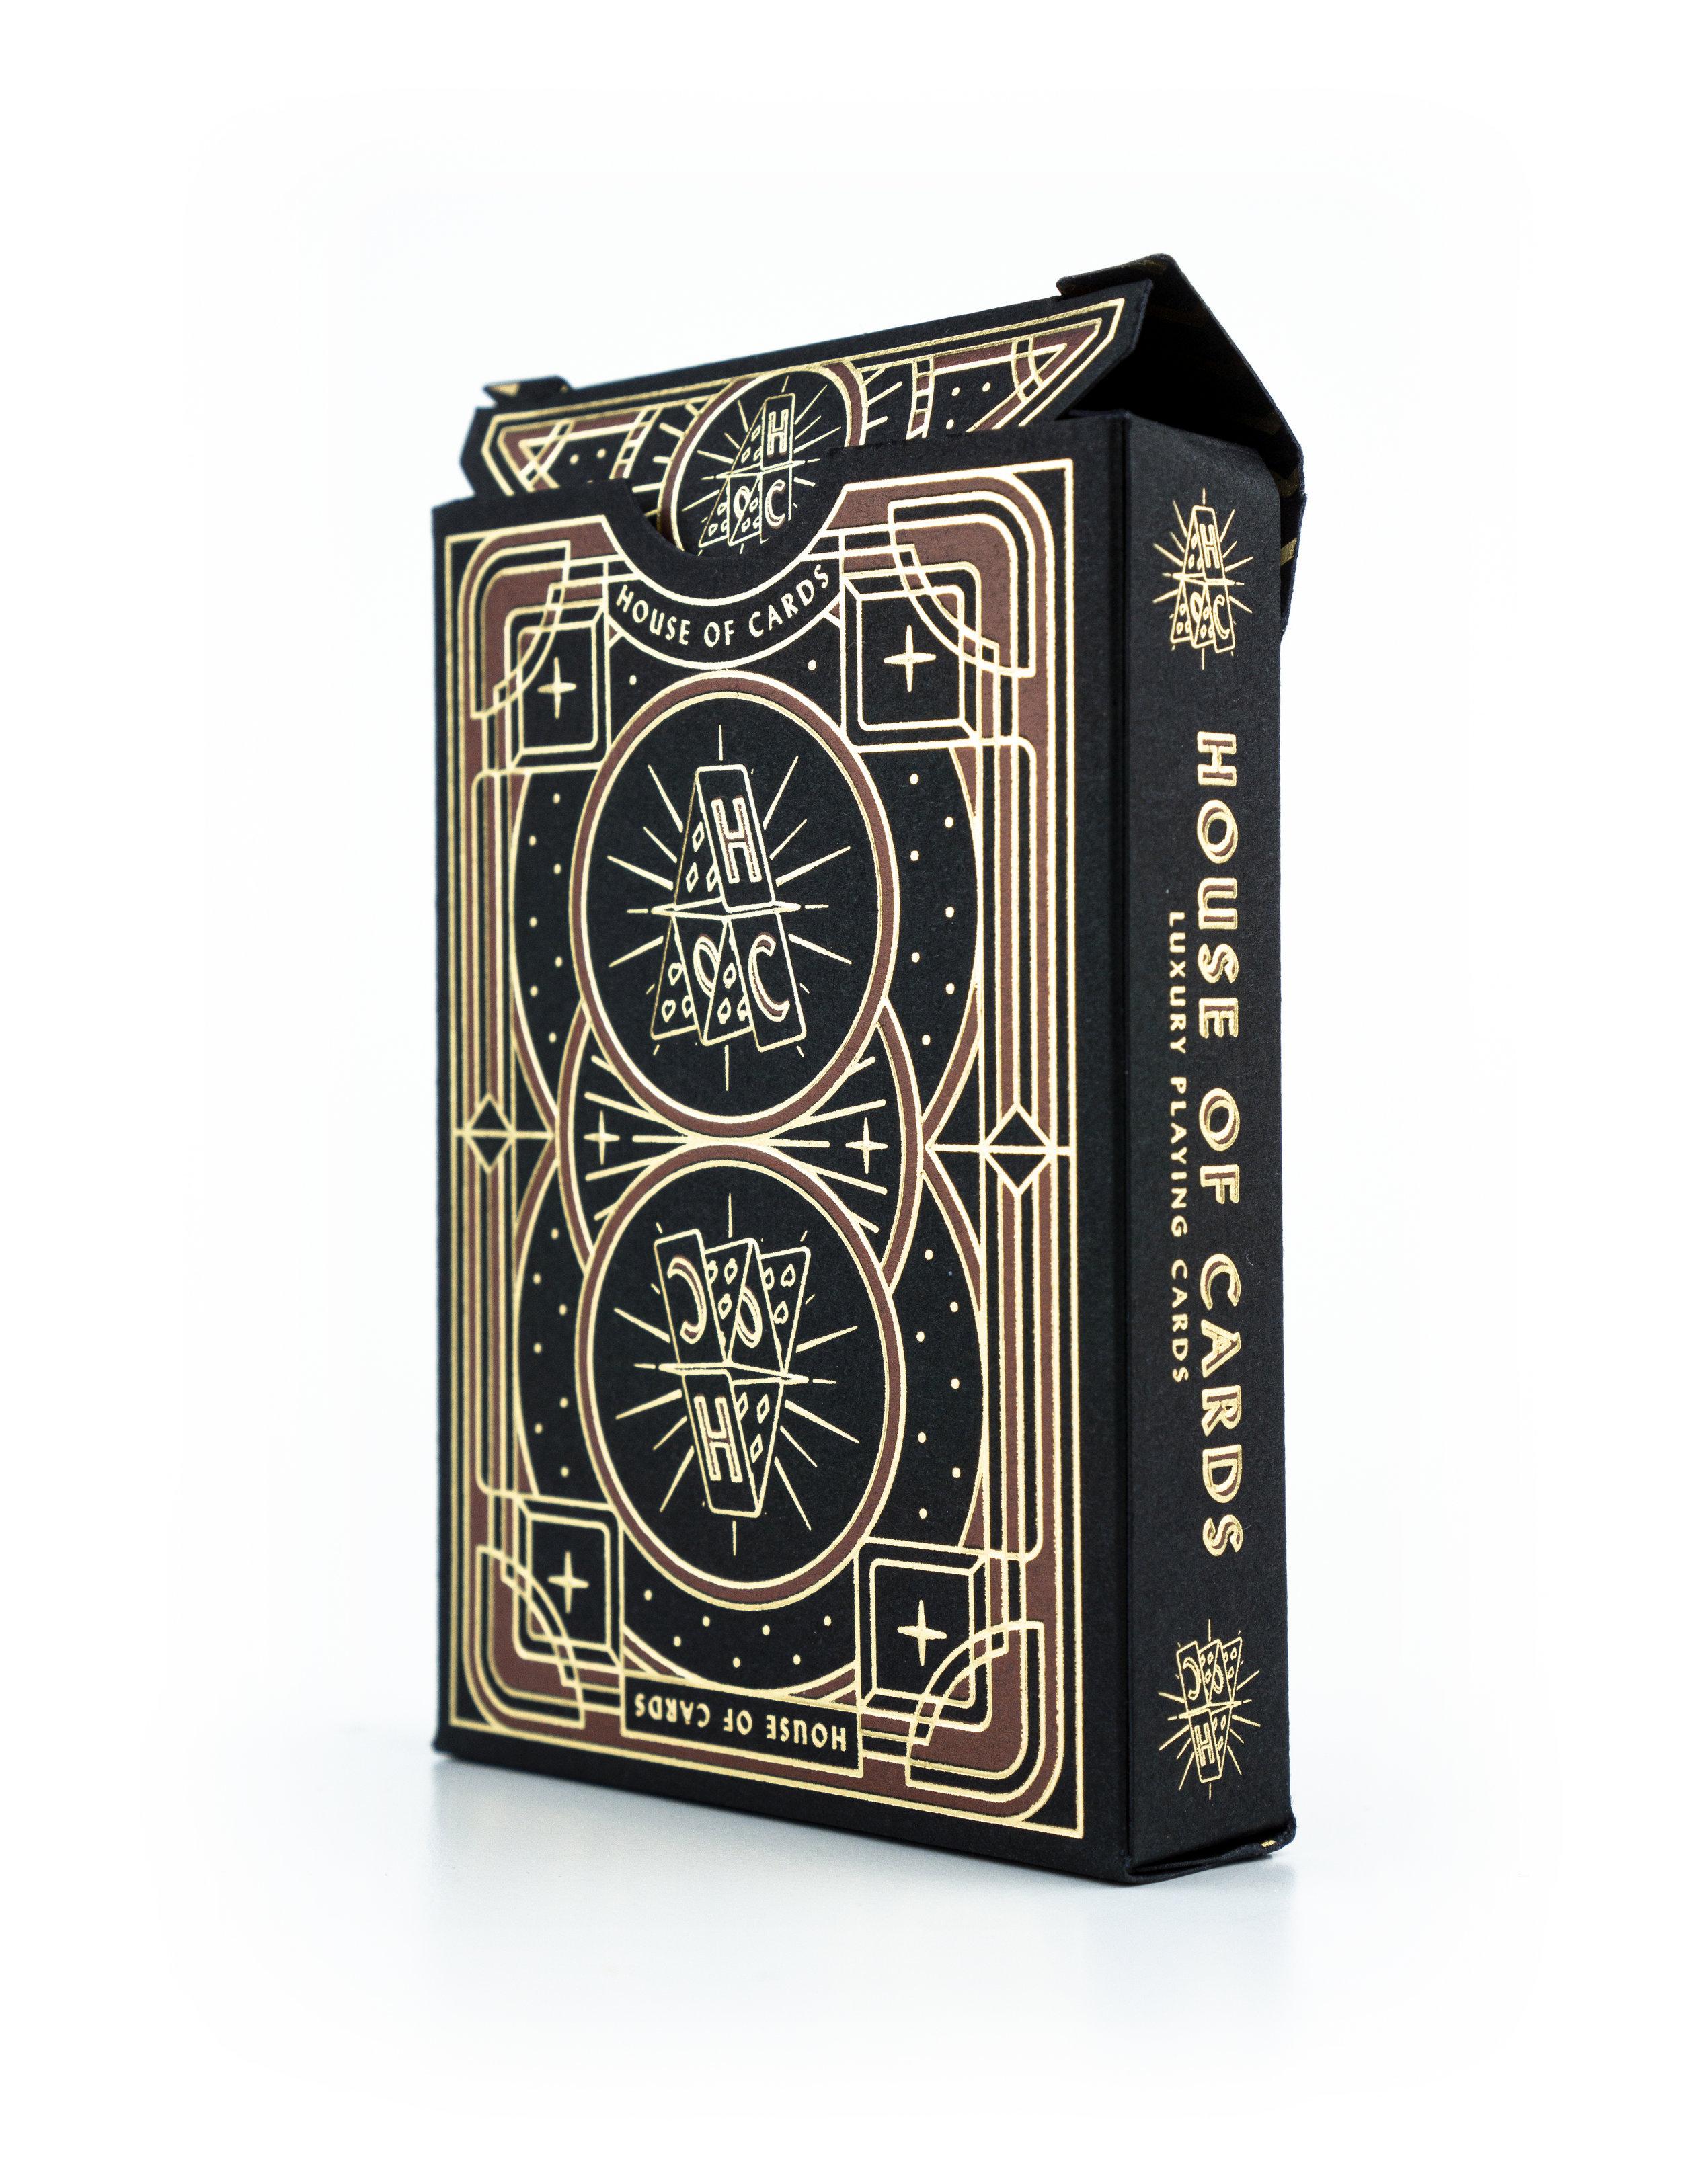 HOC-CardCase3-052119.jpg